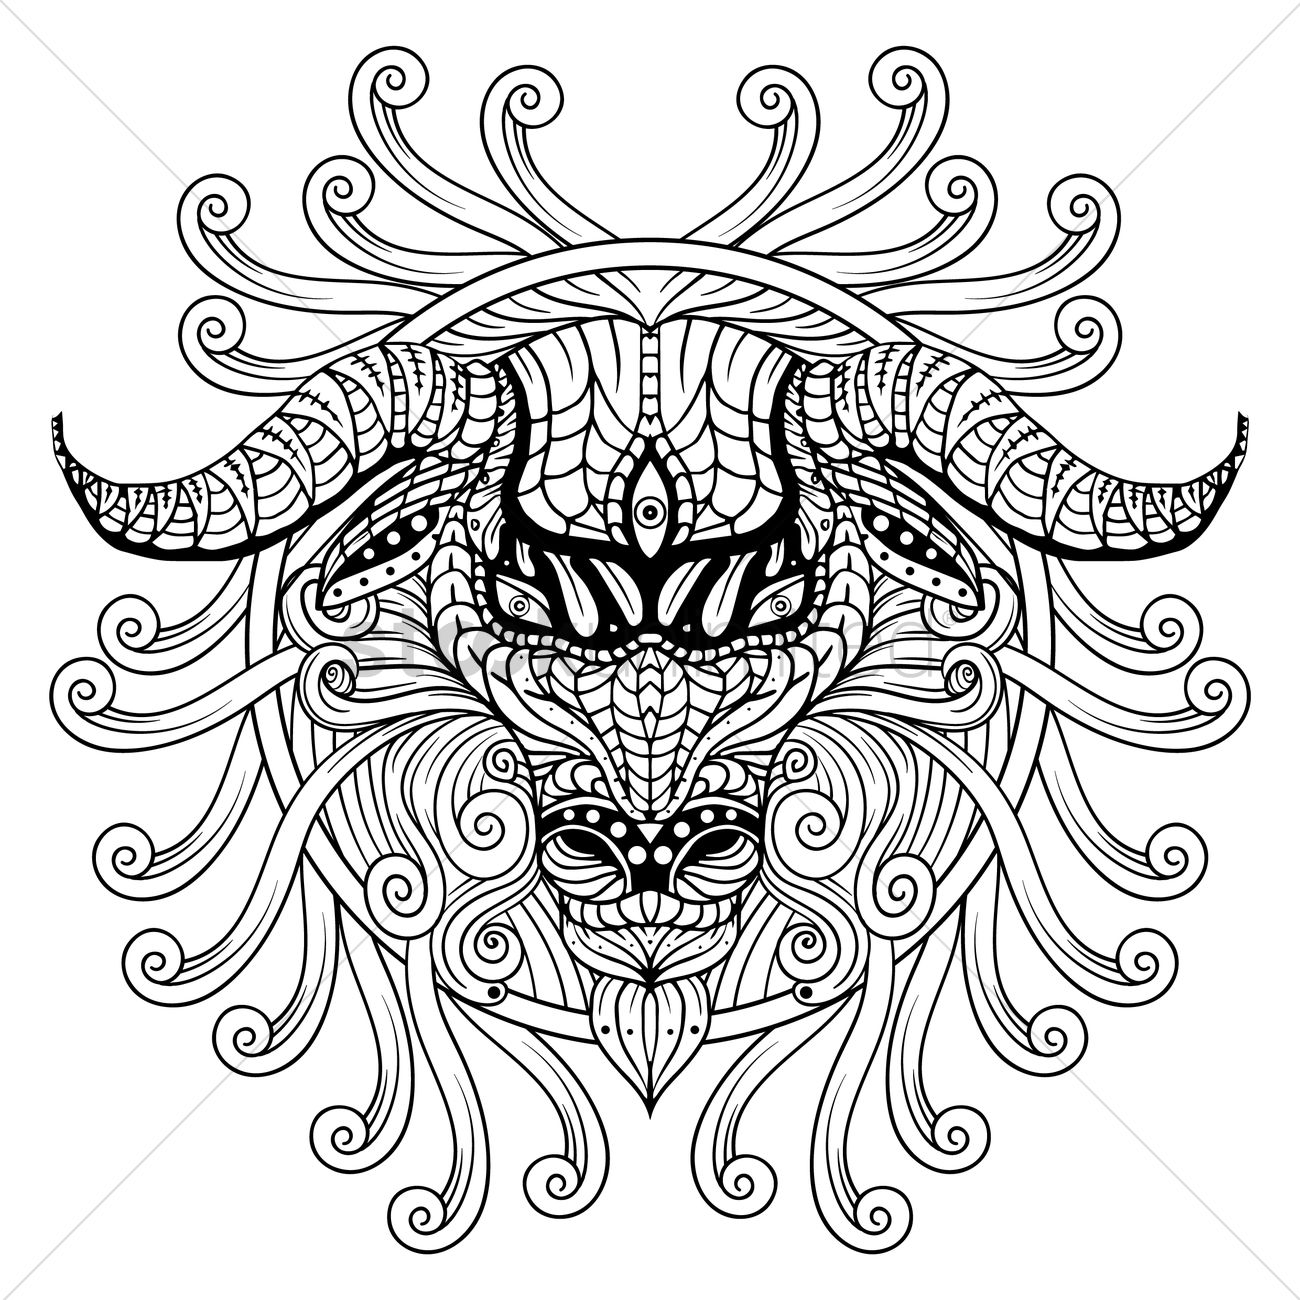 1300x1300 Free Intricate Ram Design Vector Image